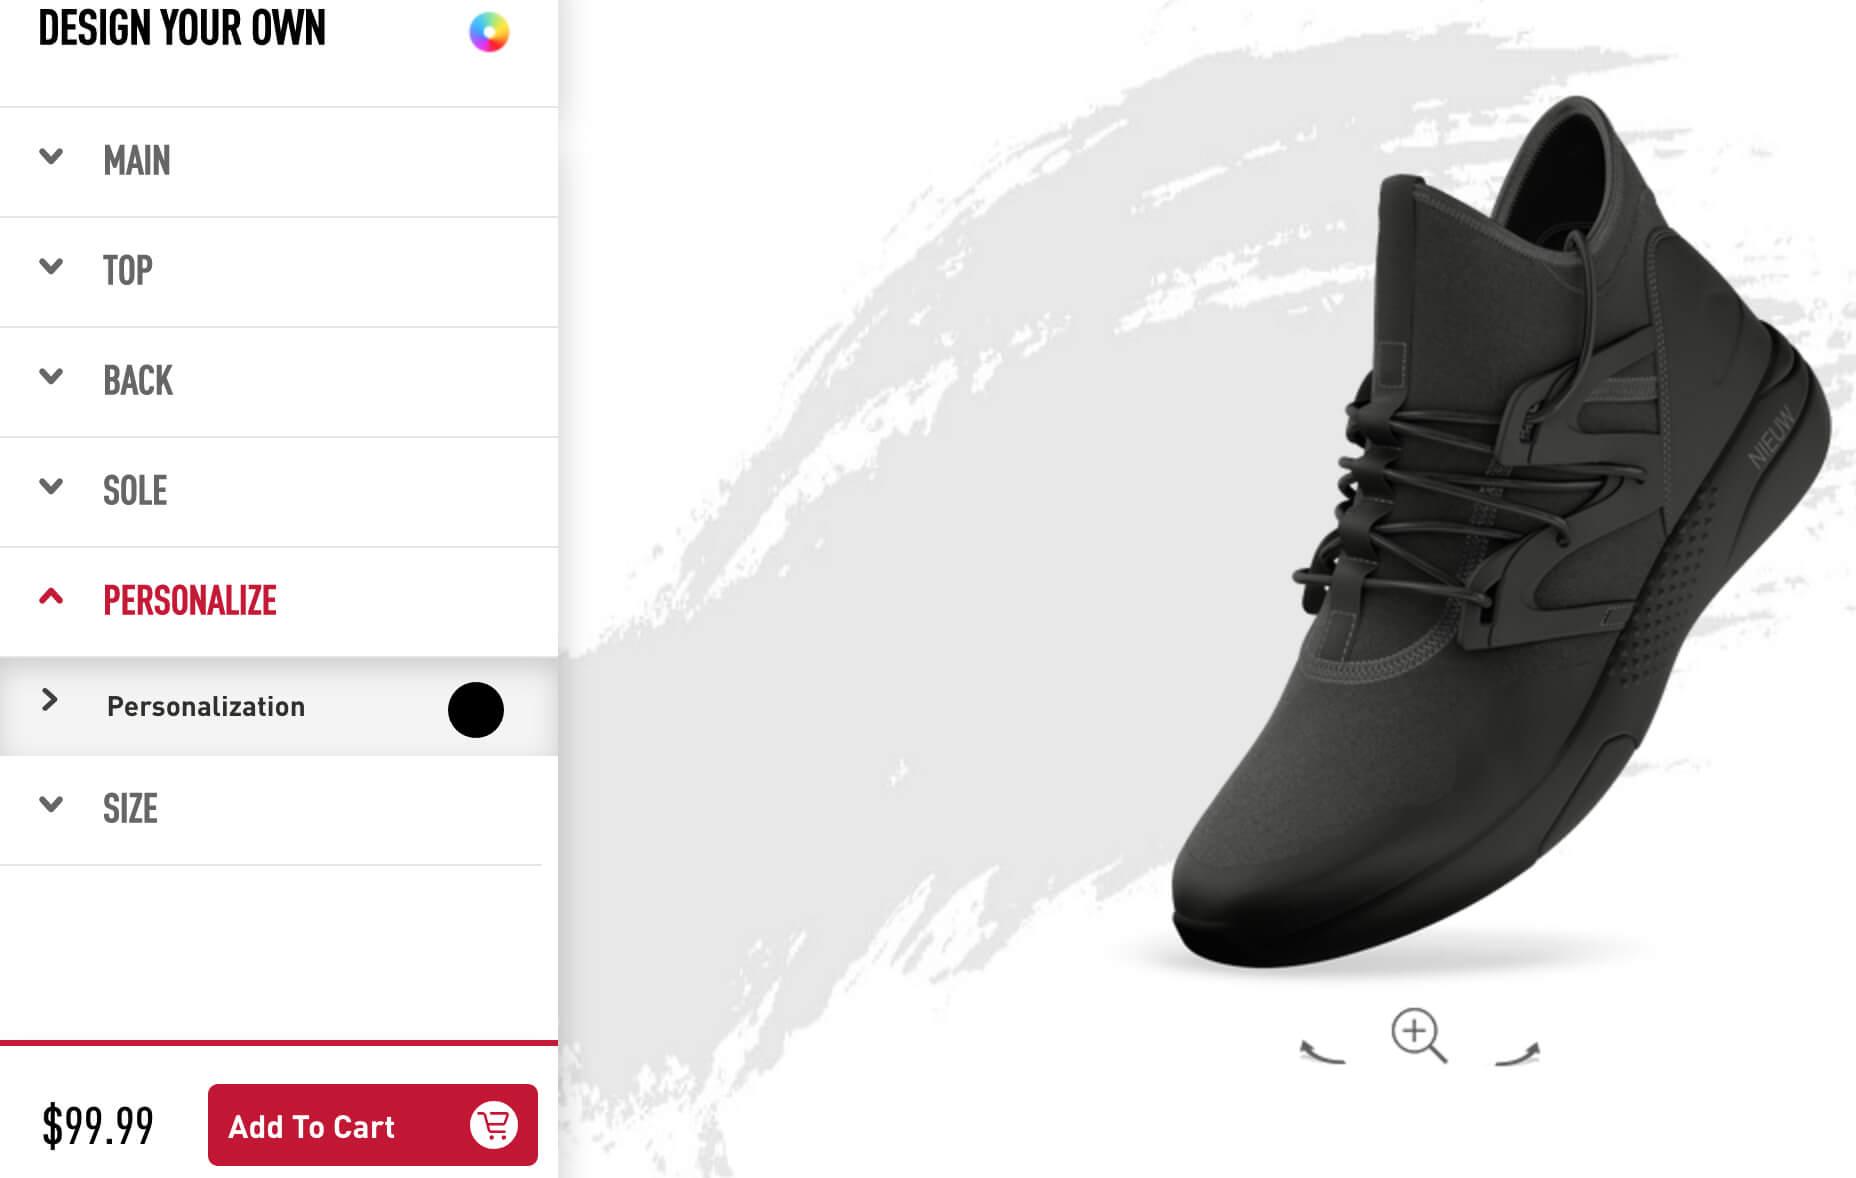 Zwart ontworpen reebok sneaker